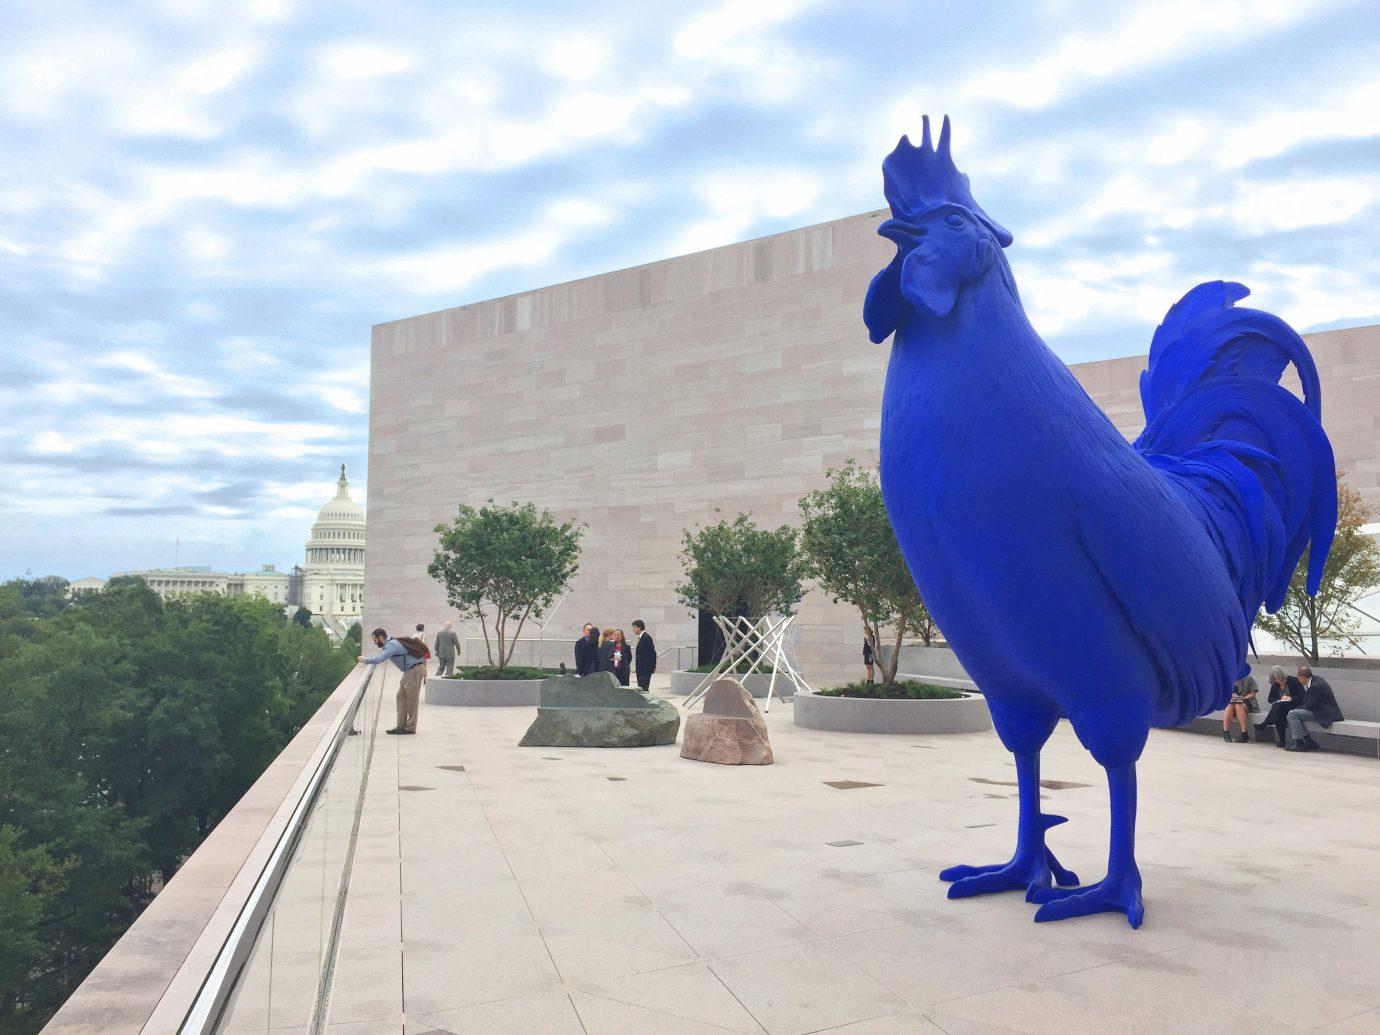 Offbeat outdoor sky blue statue sculpture monument vacation art